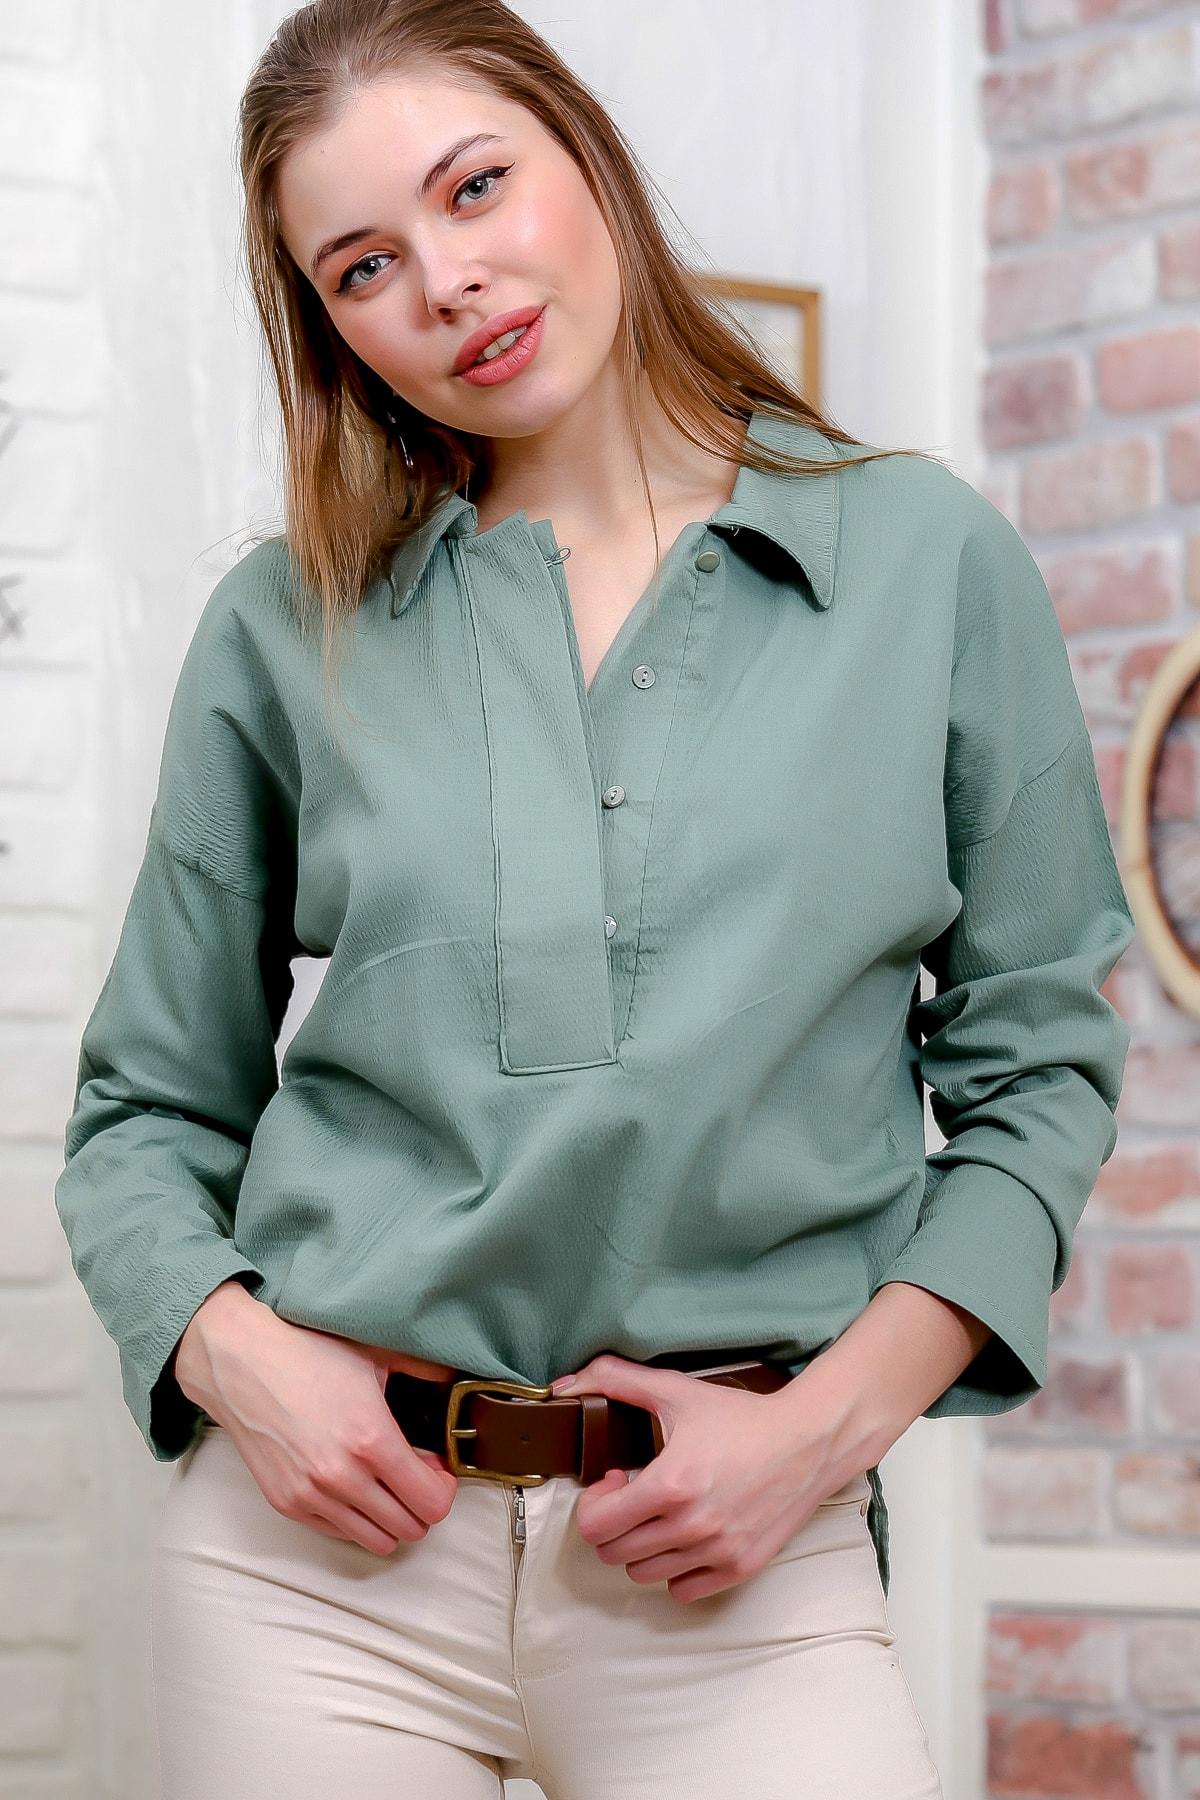 Chiccy Kadın Mint Gömlek Yaka Gizli Pat Detaylı Dokuma Bluz M10010200BL95583